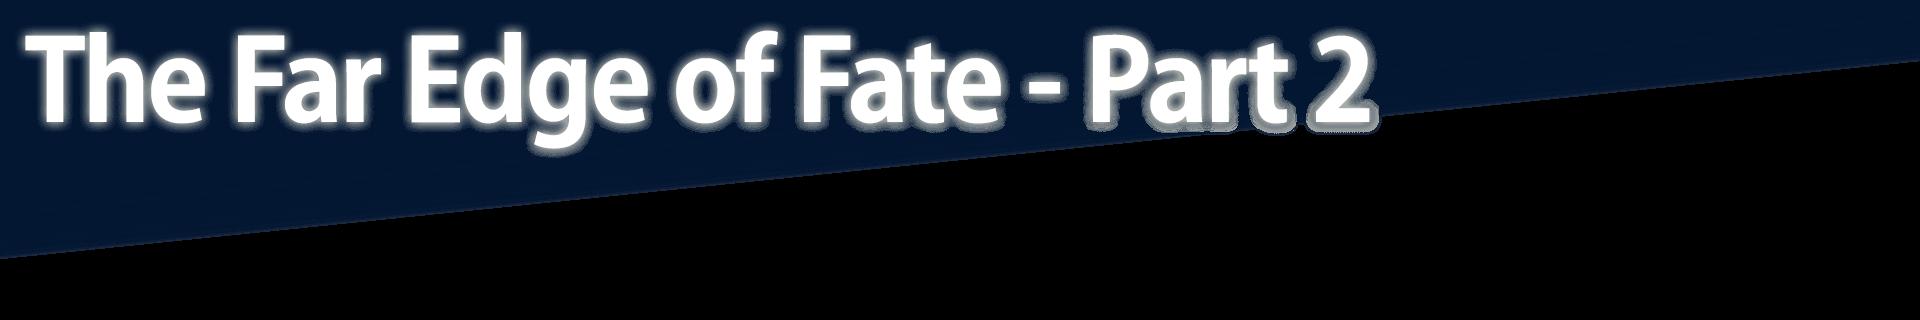 The Far Edge of Fate - Part 2